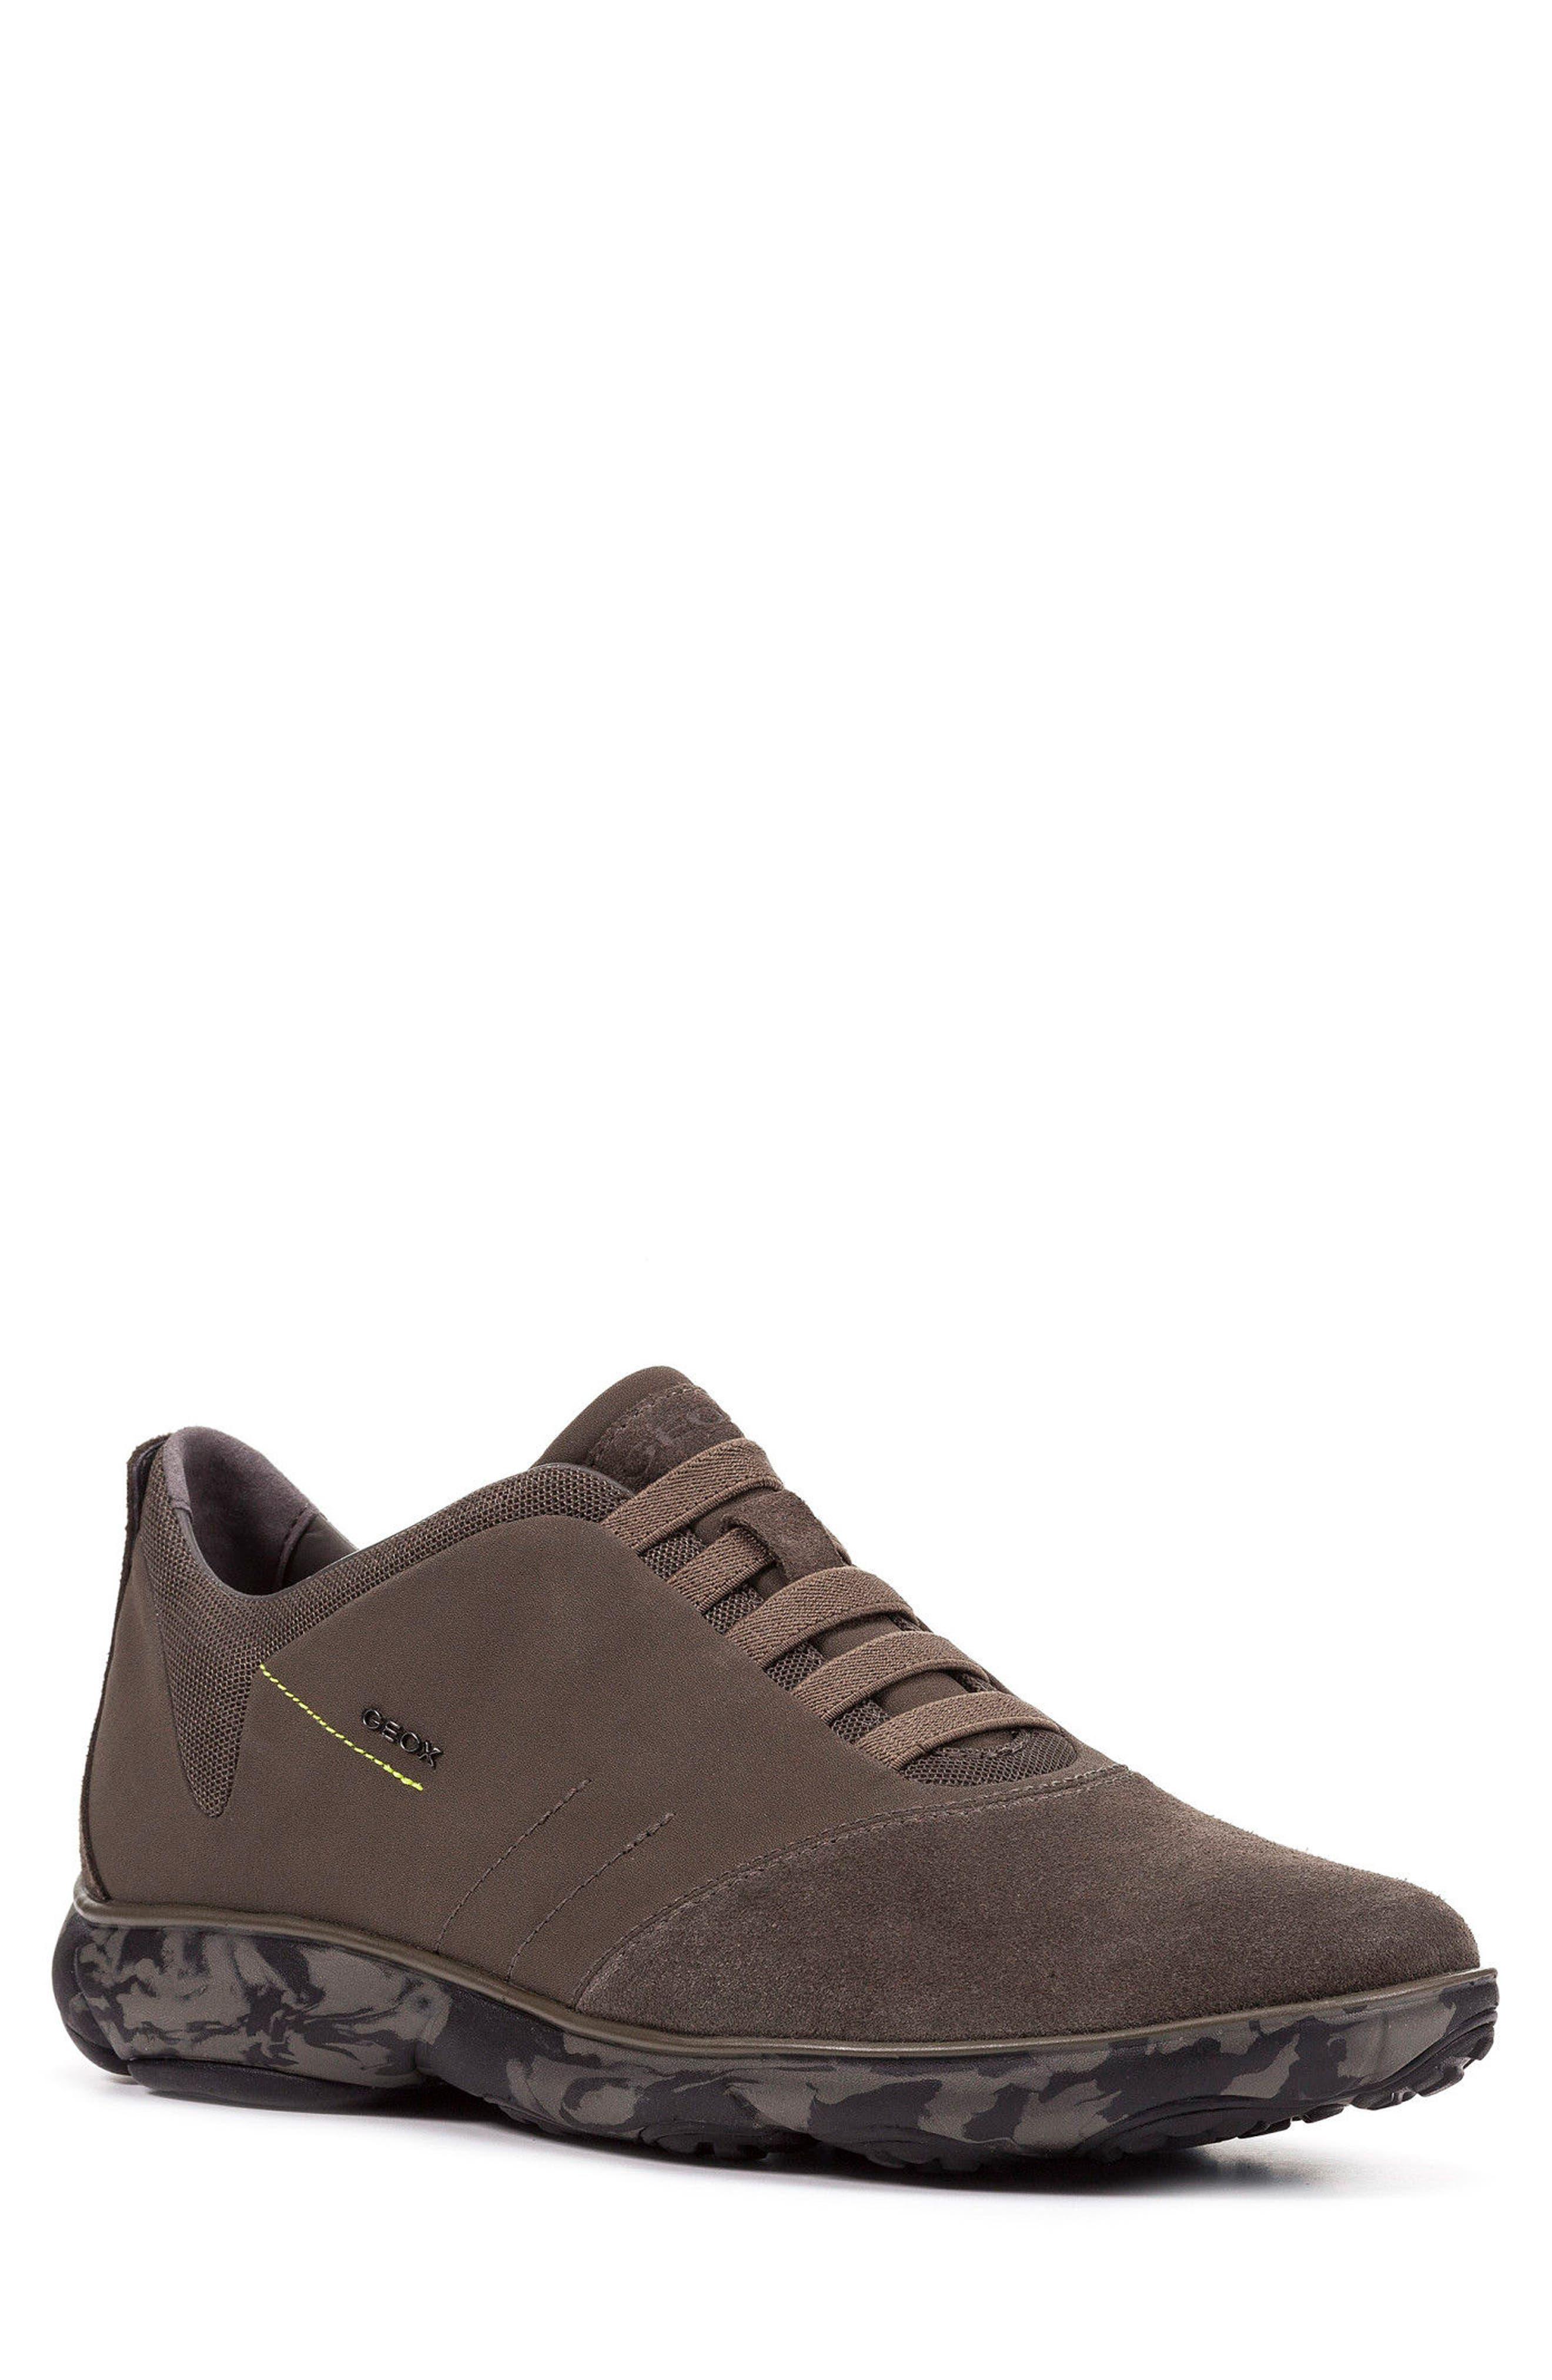 'Nebula 24' Slip-On Sneaker,                         Main,                         color, Military